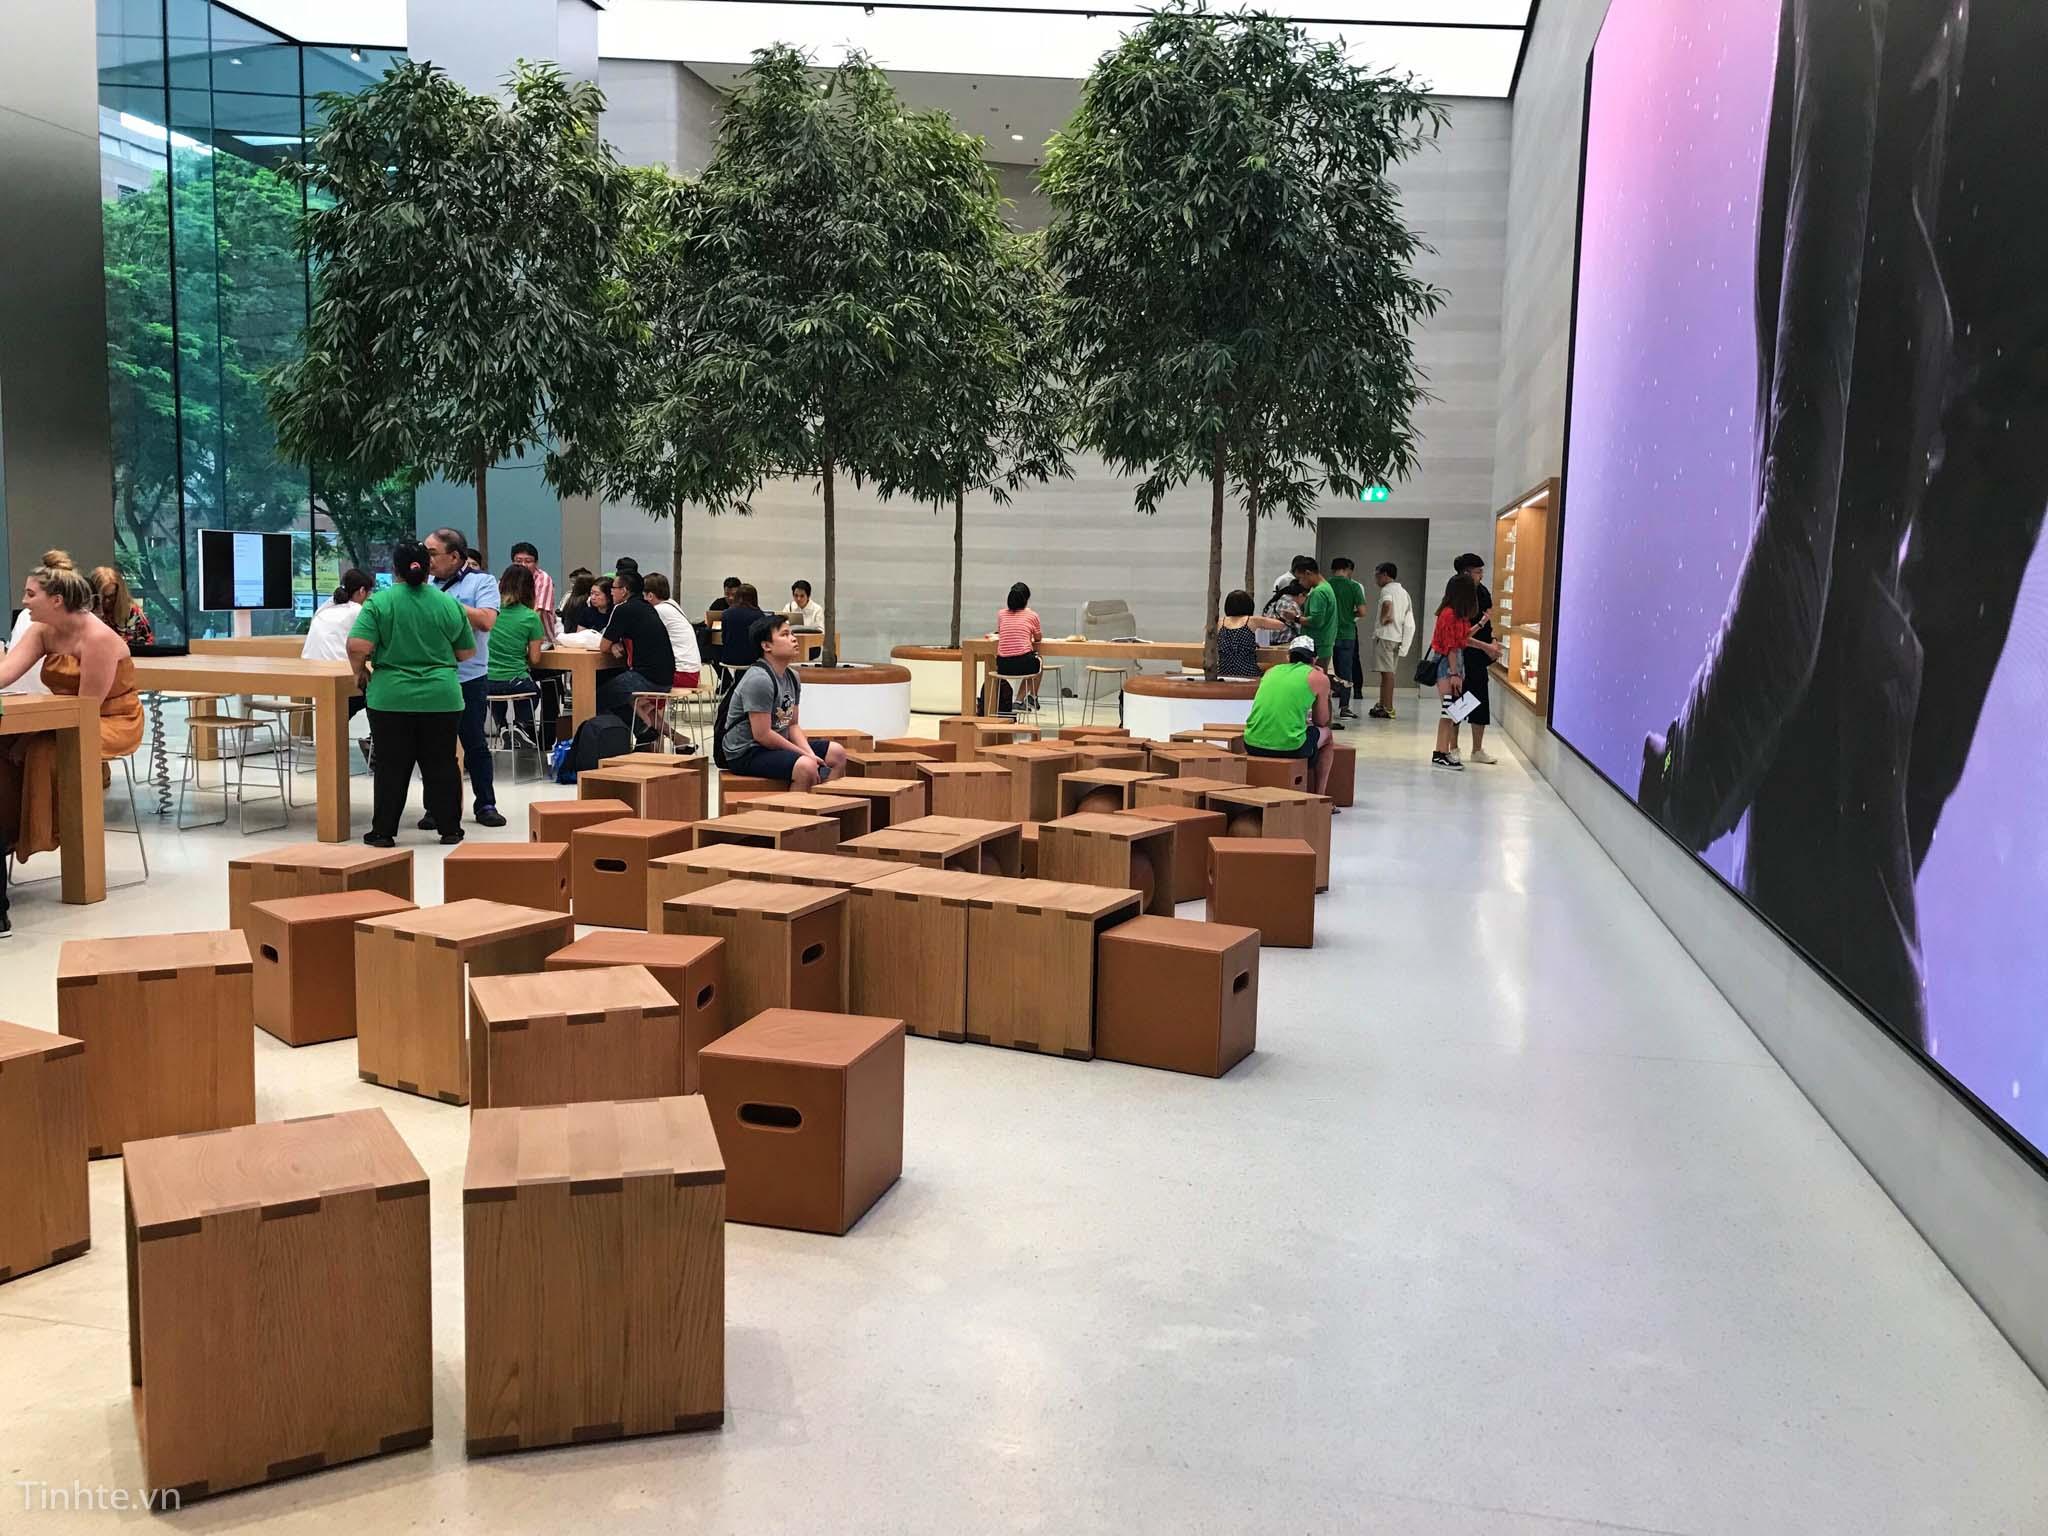 Apple-Store-Orchard-3.jpg